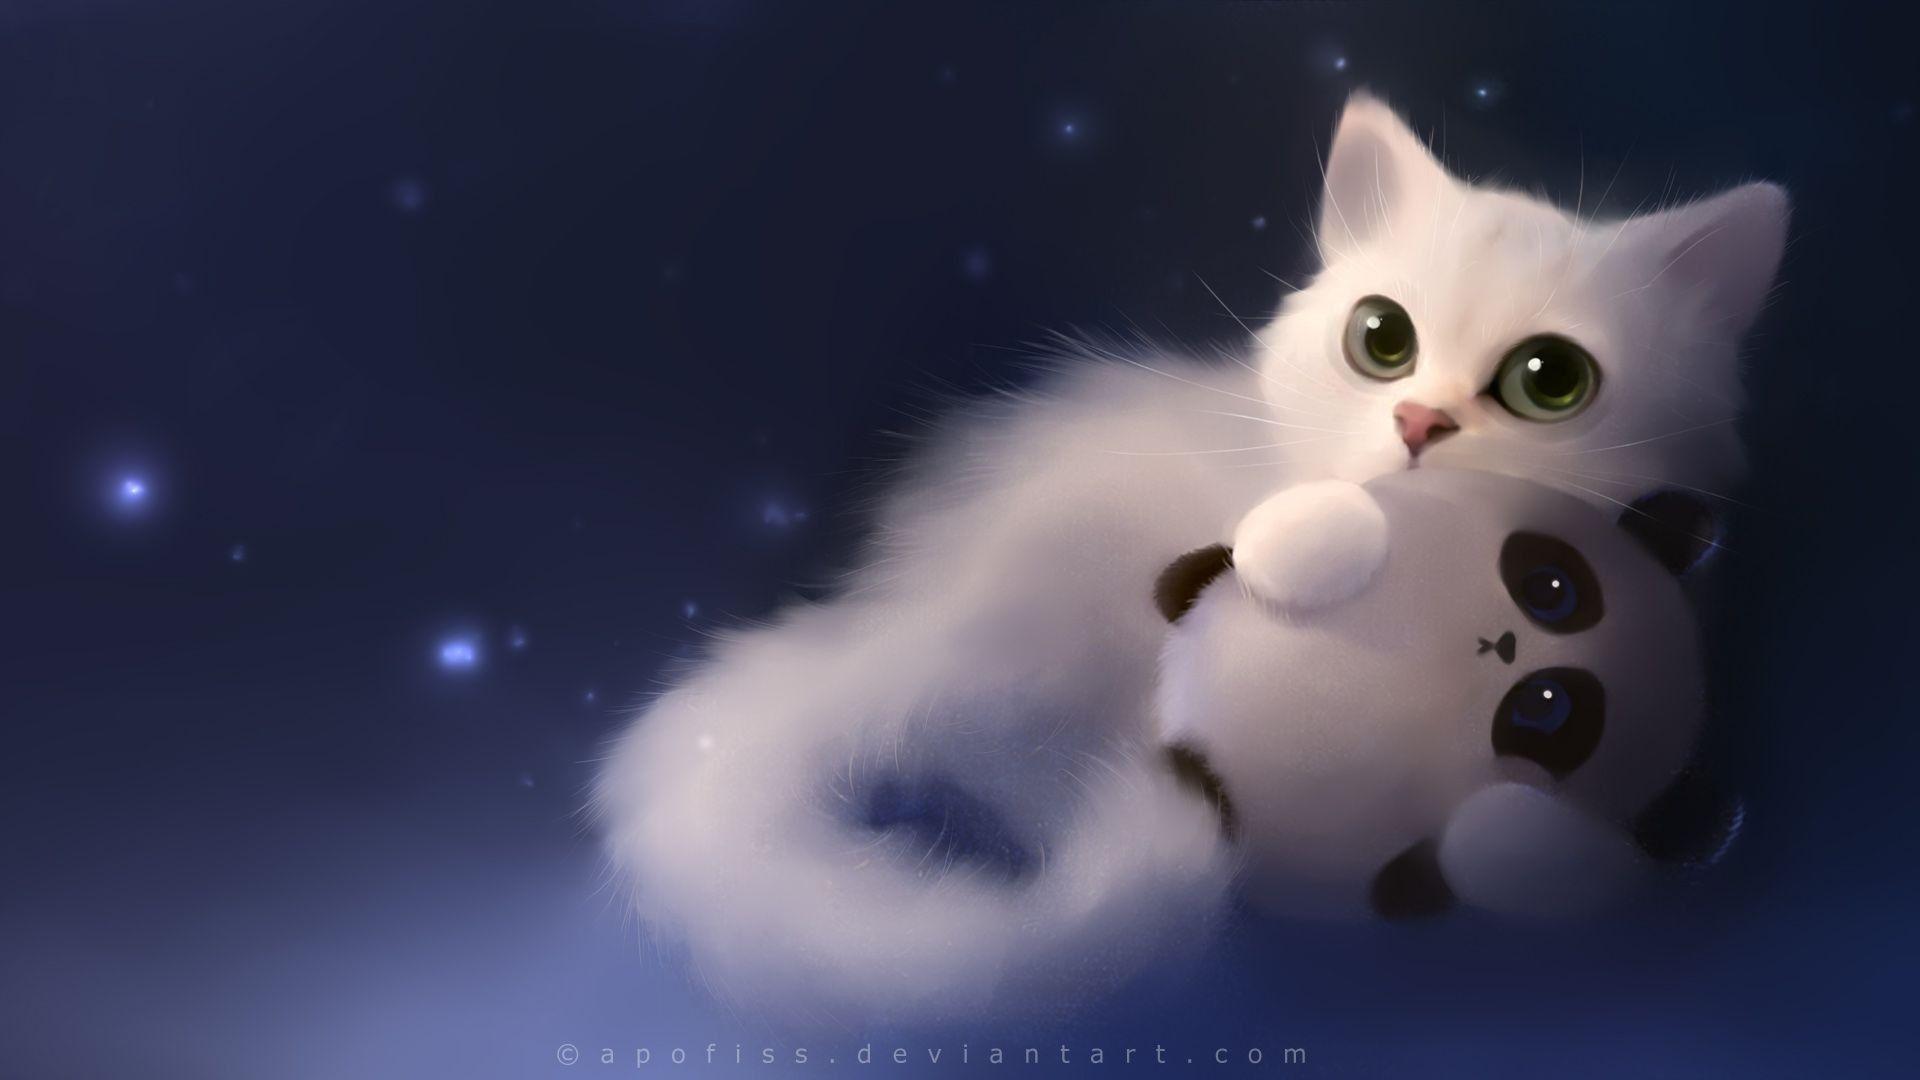 Cute Anime Cat Wallpapers Top Free Cute Anime Cat Backgrounds Cute Anime Cat Cute Cat Wallpaper Anime Kitten